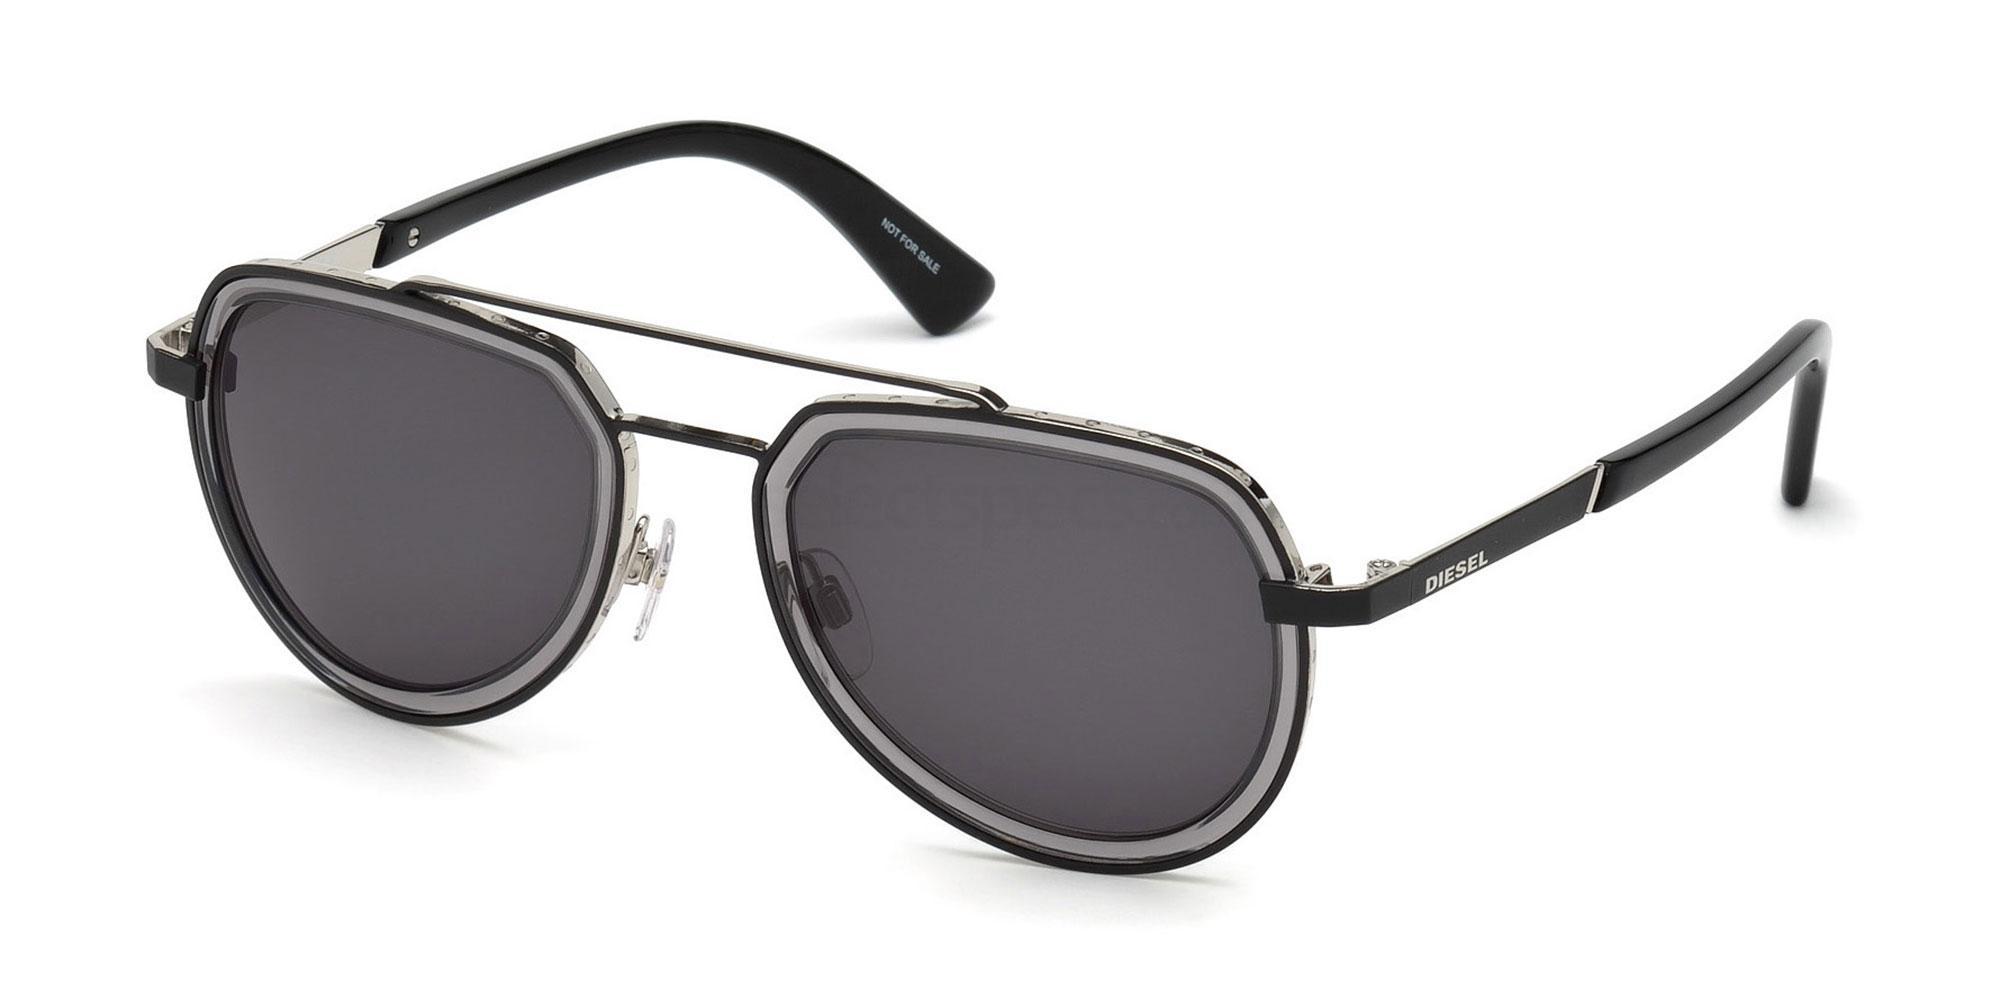 02A DL0266 Sunglasses, Diesel